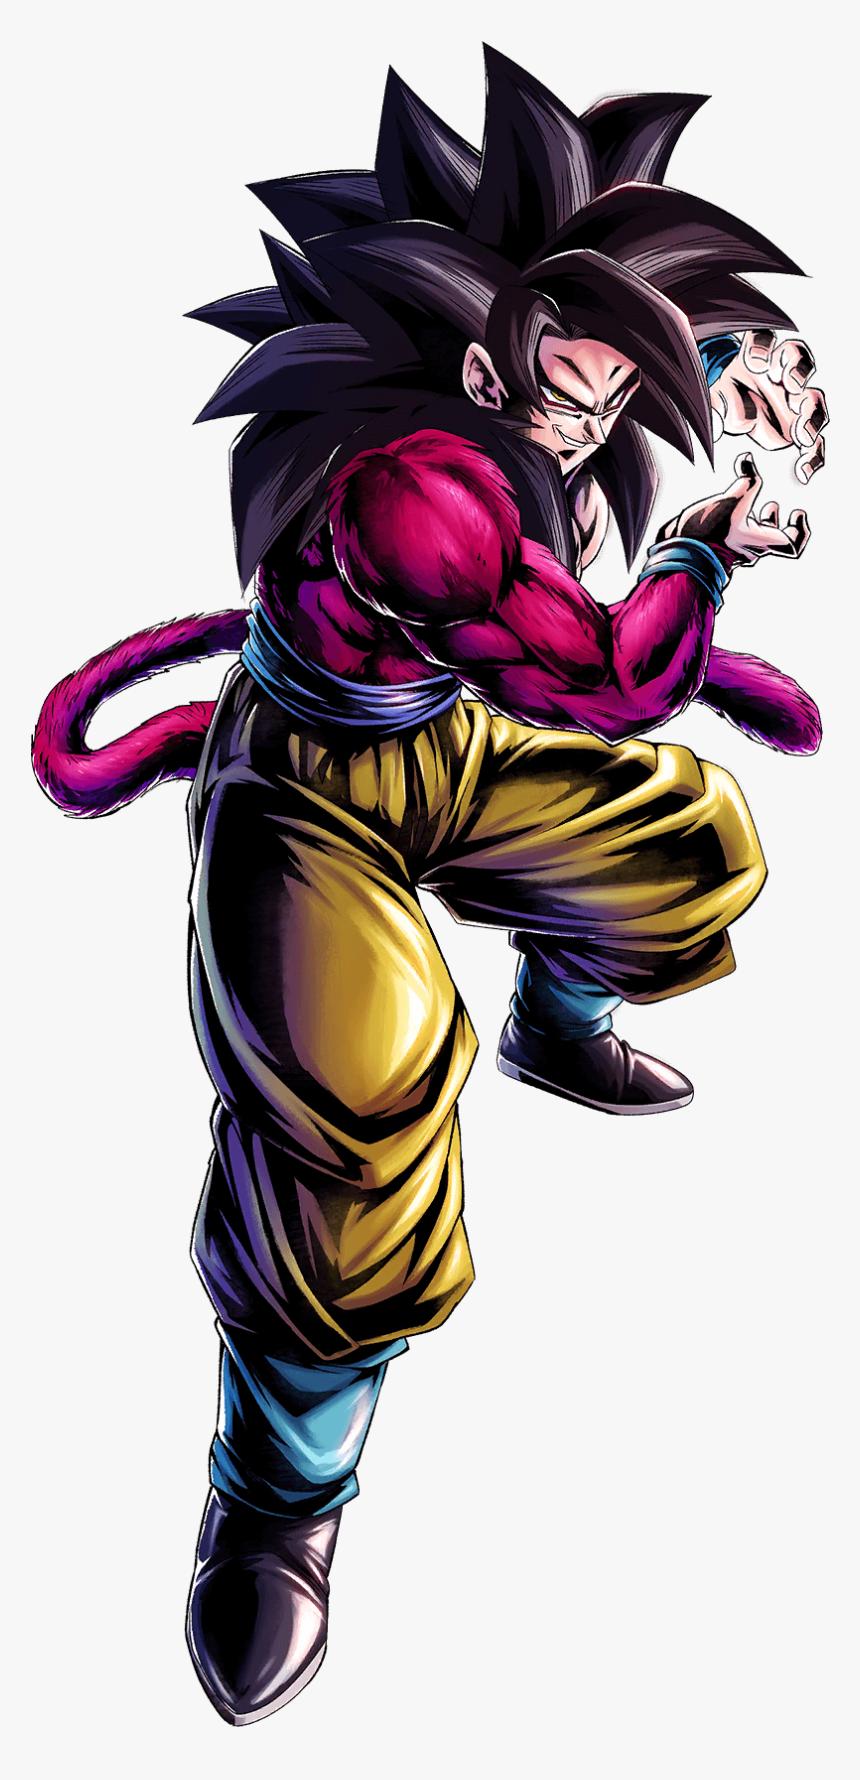 Super Saiyan 4 Goku Dragon Ball Legends Hd Png Download Is Free Transparent Png Image To Explore More Super Saiyan 4 Goku Dragon Ball Anime Dragon Ball Super